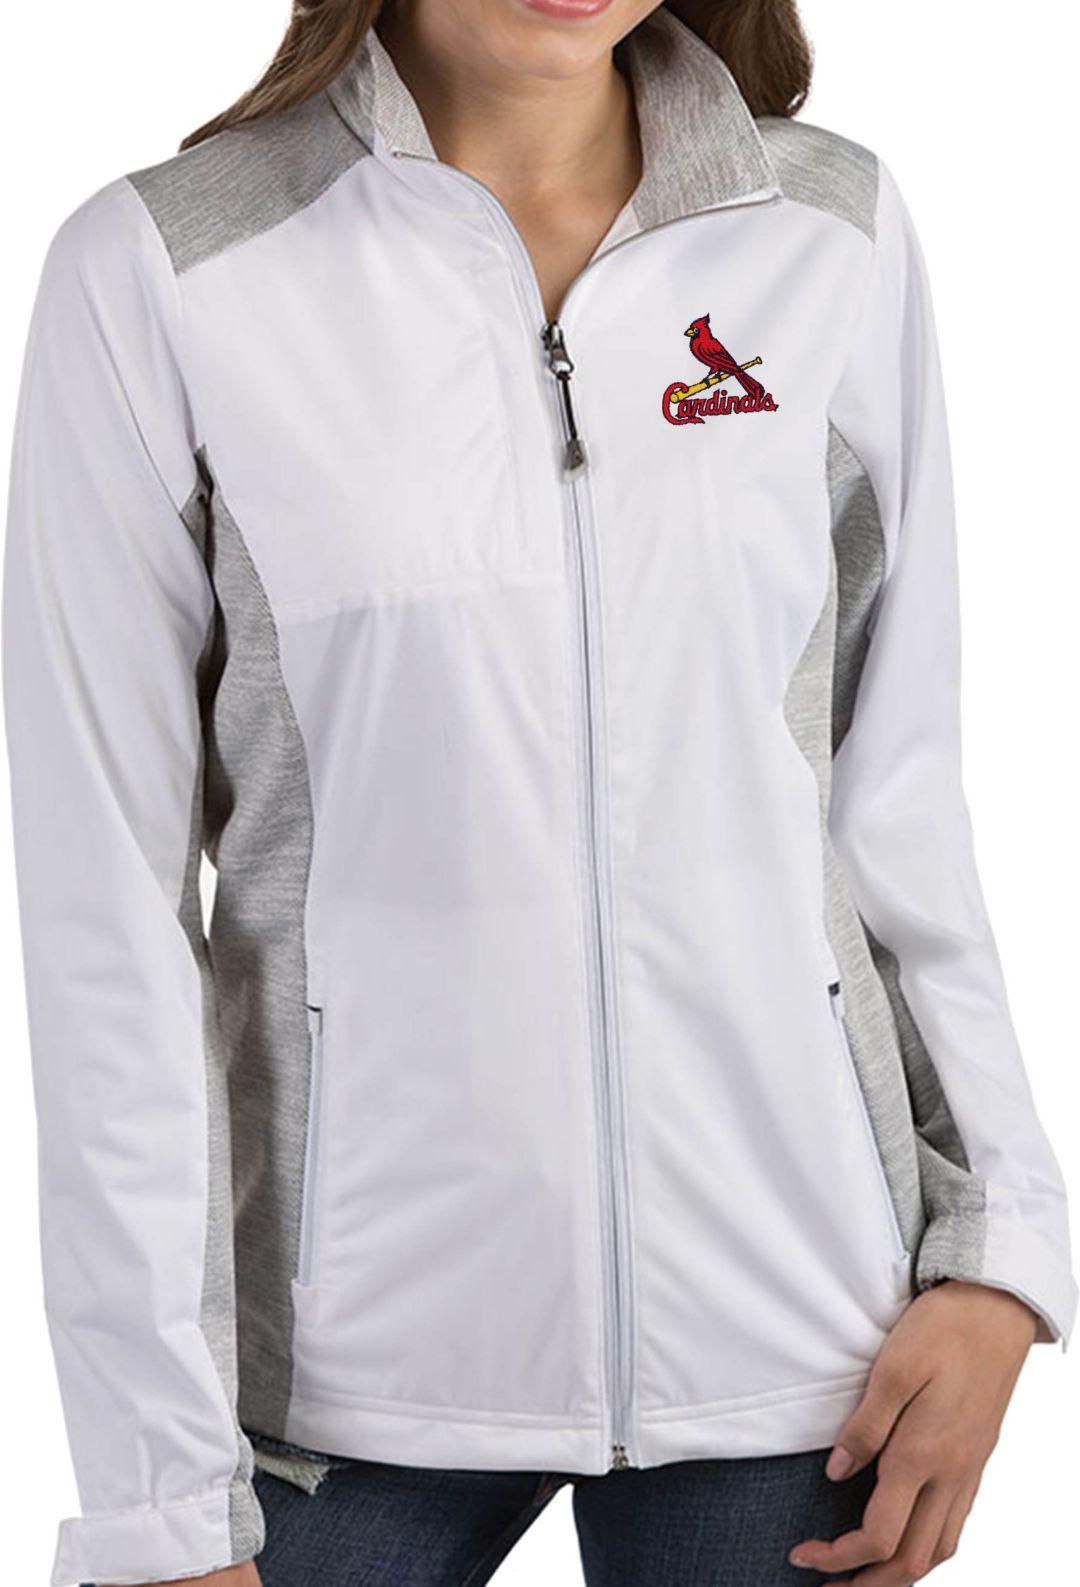 innovative design ff478 e91a6 Antigua Women's St. Louis Cardinals Revolve White Full-Zip Jacket